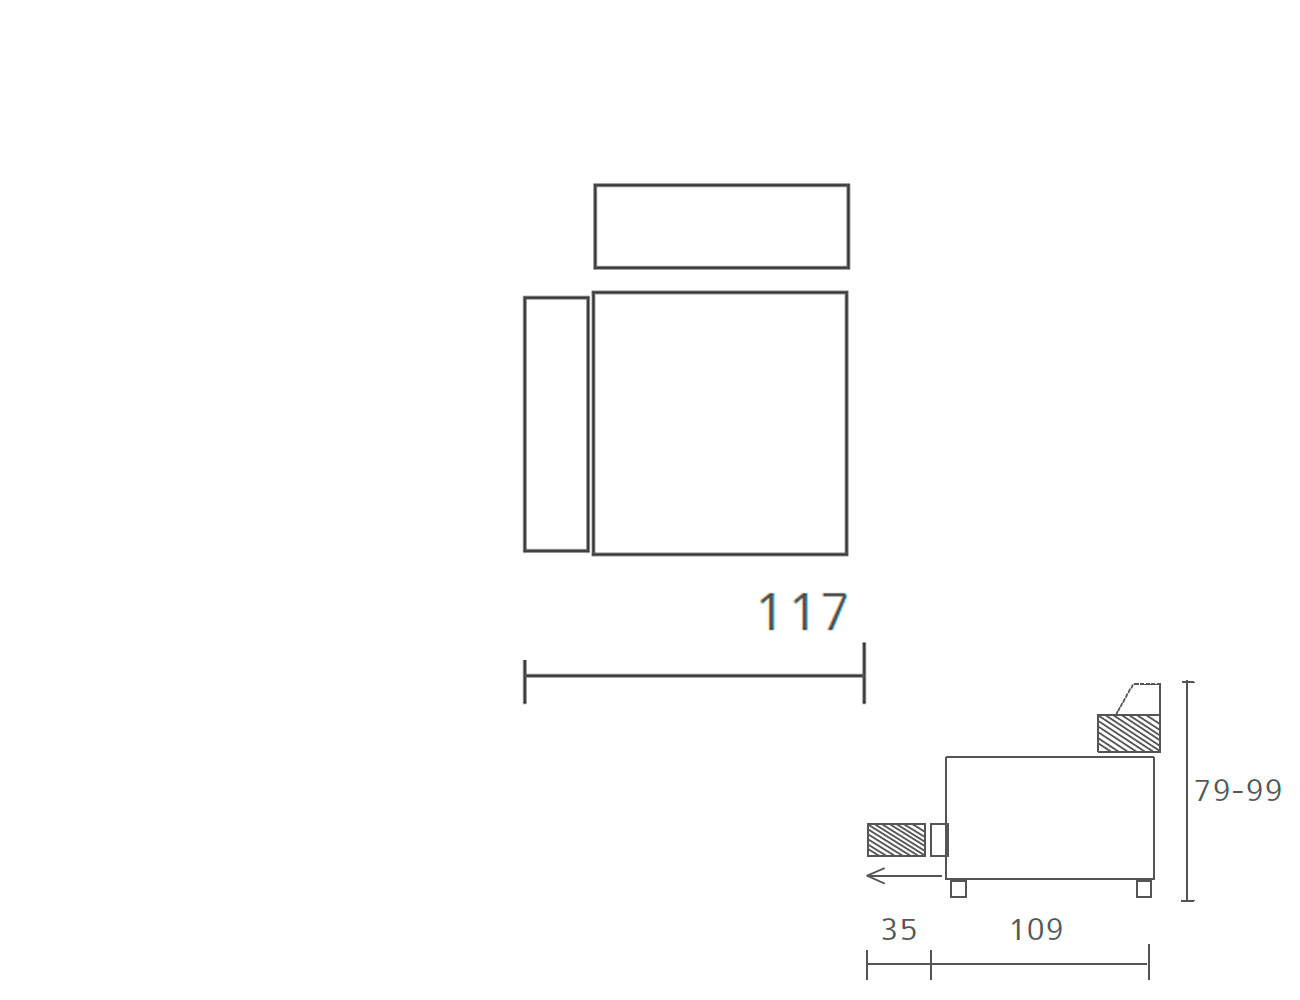 Sofa piel 1 plaza 117